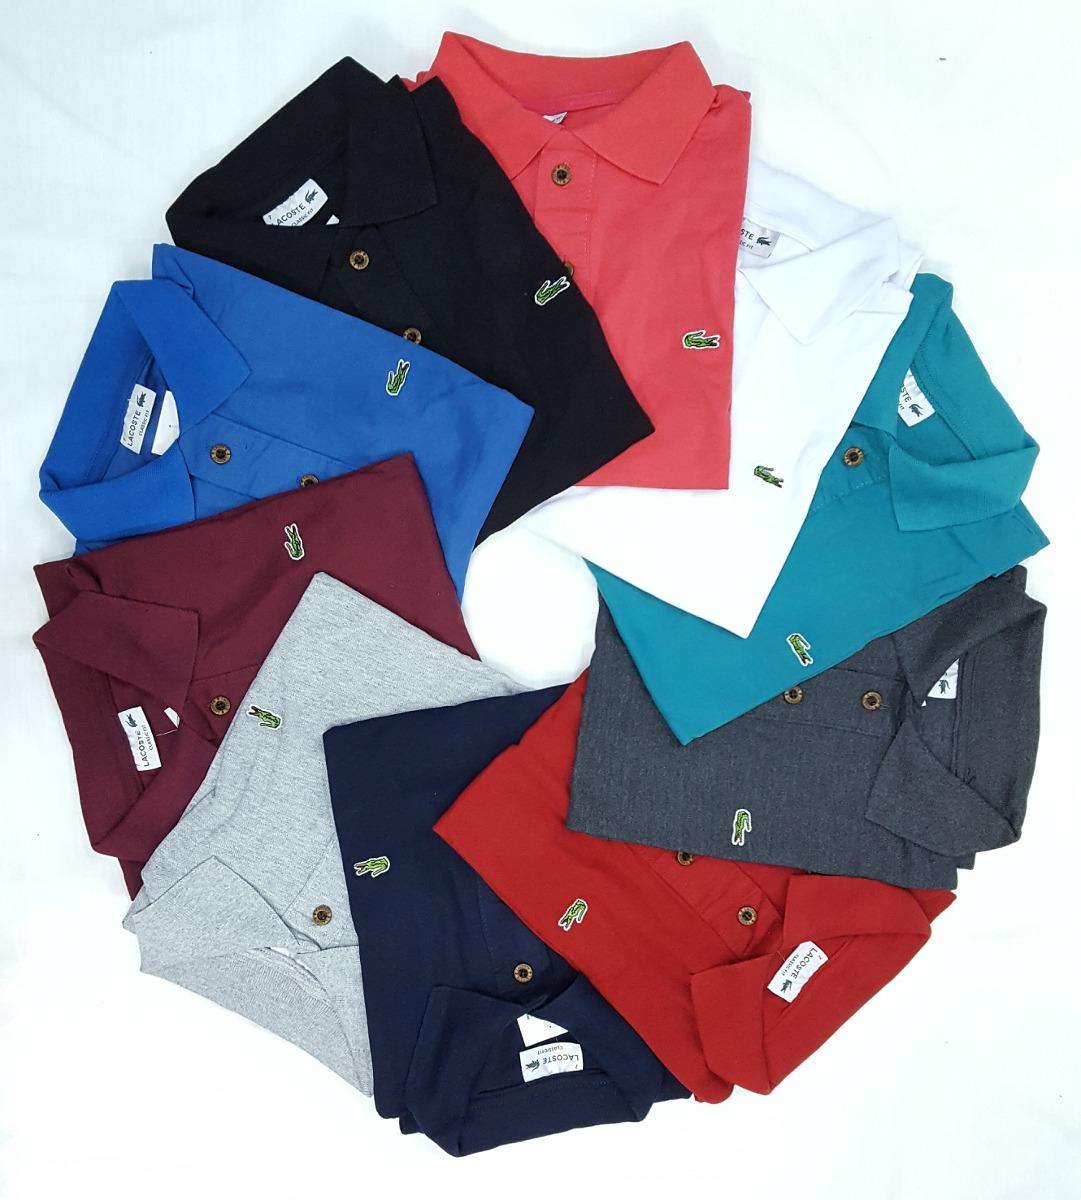 ba58900125 Kit 10 Camisa Polo Camiseta Jacaré Social Masculina - R  215